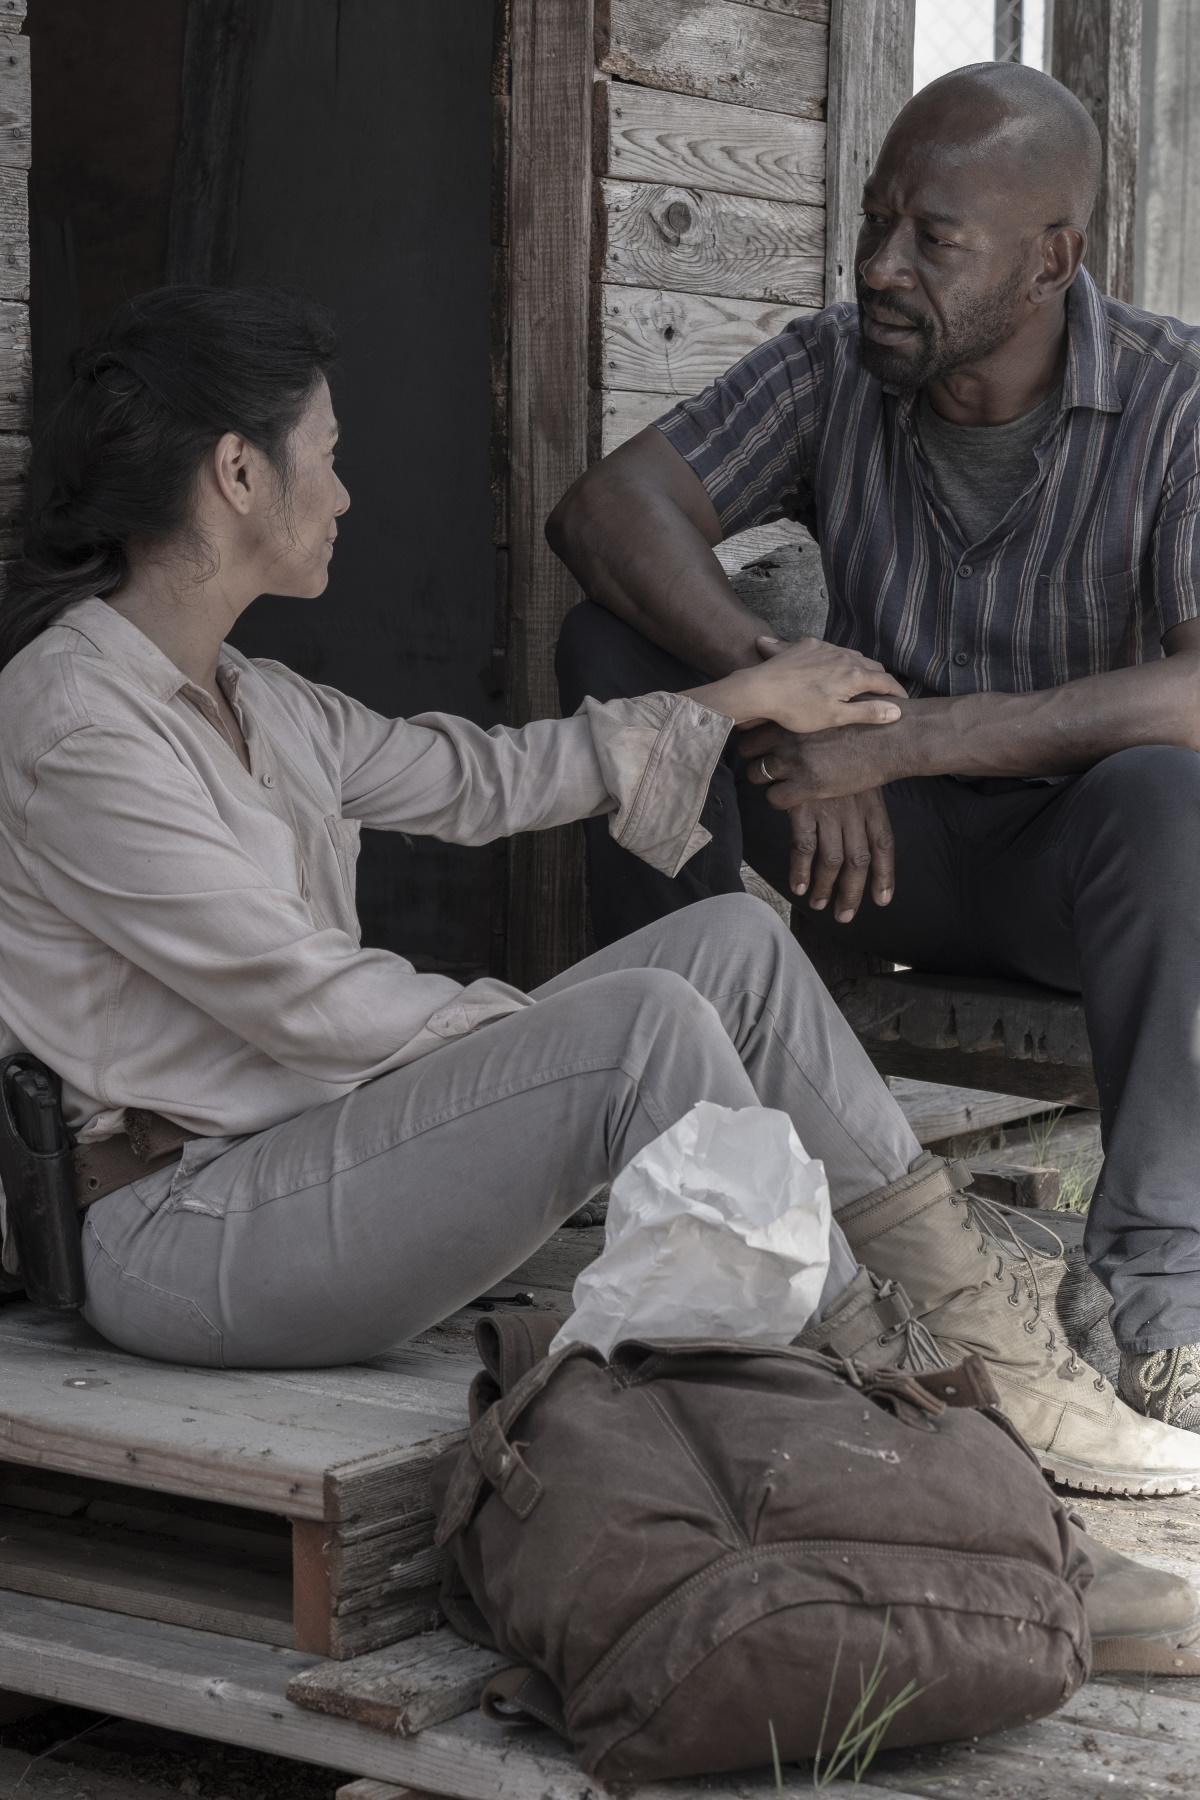 Karen David as Grace and Lennie James as Morgan, as seen in Episode 16 of AMC's Fear the Walking Dead Season 5